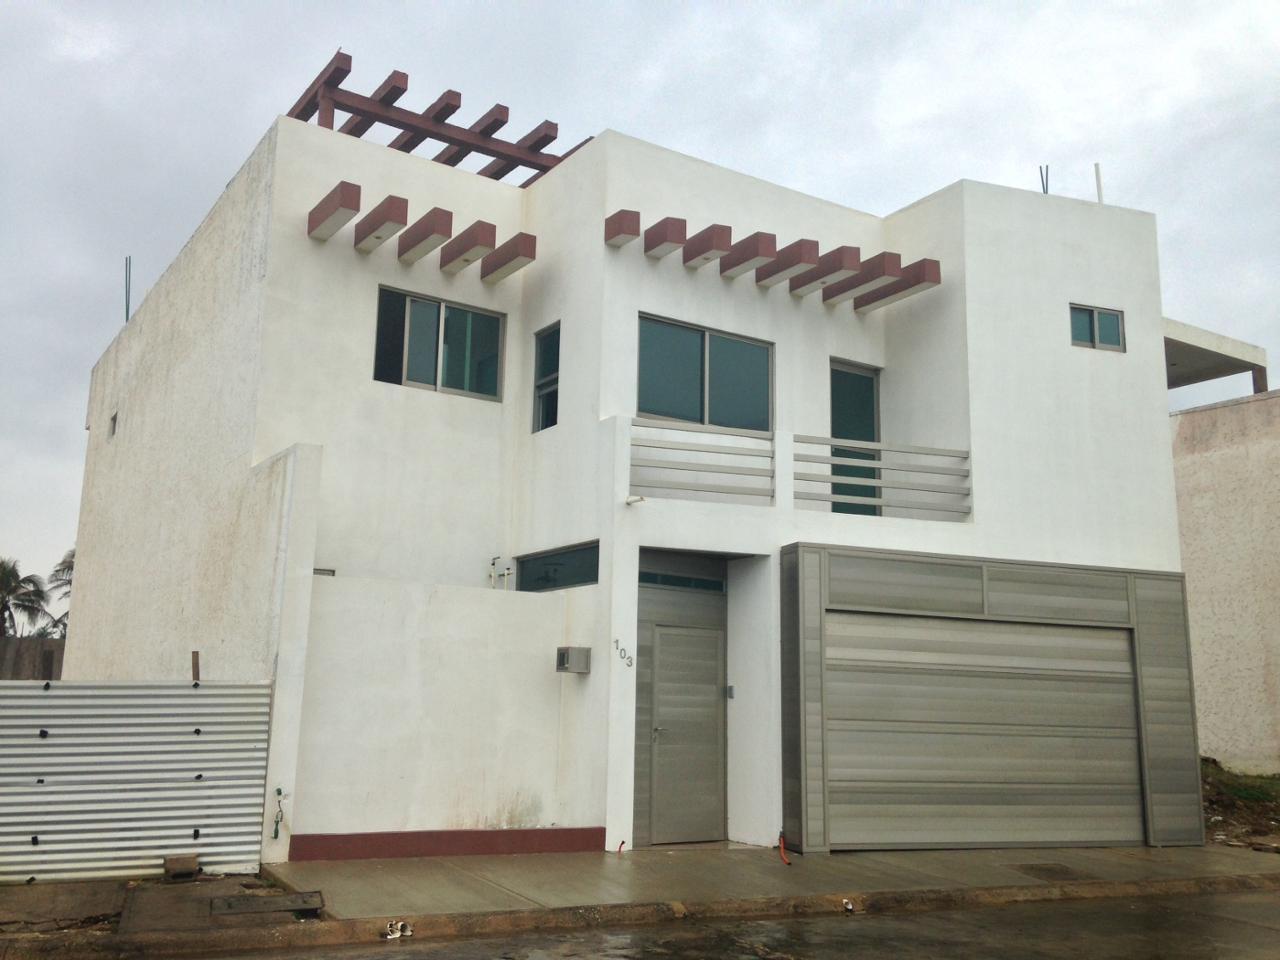 219 casas en renta en coatzacoalcos veracruz for Casas en renta coatzacoalcos